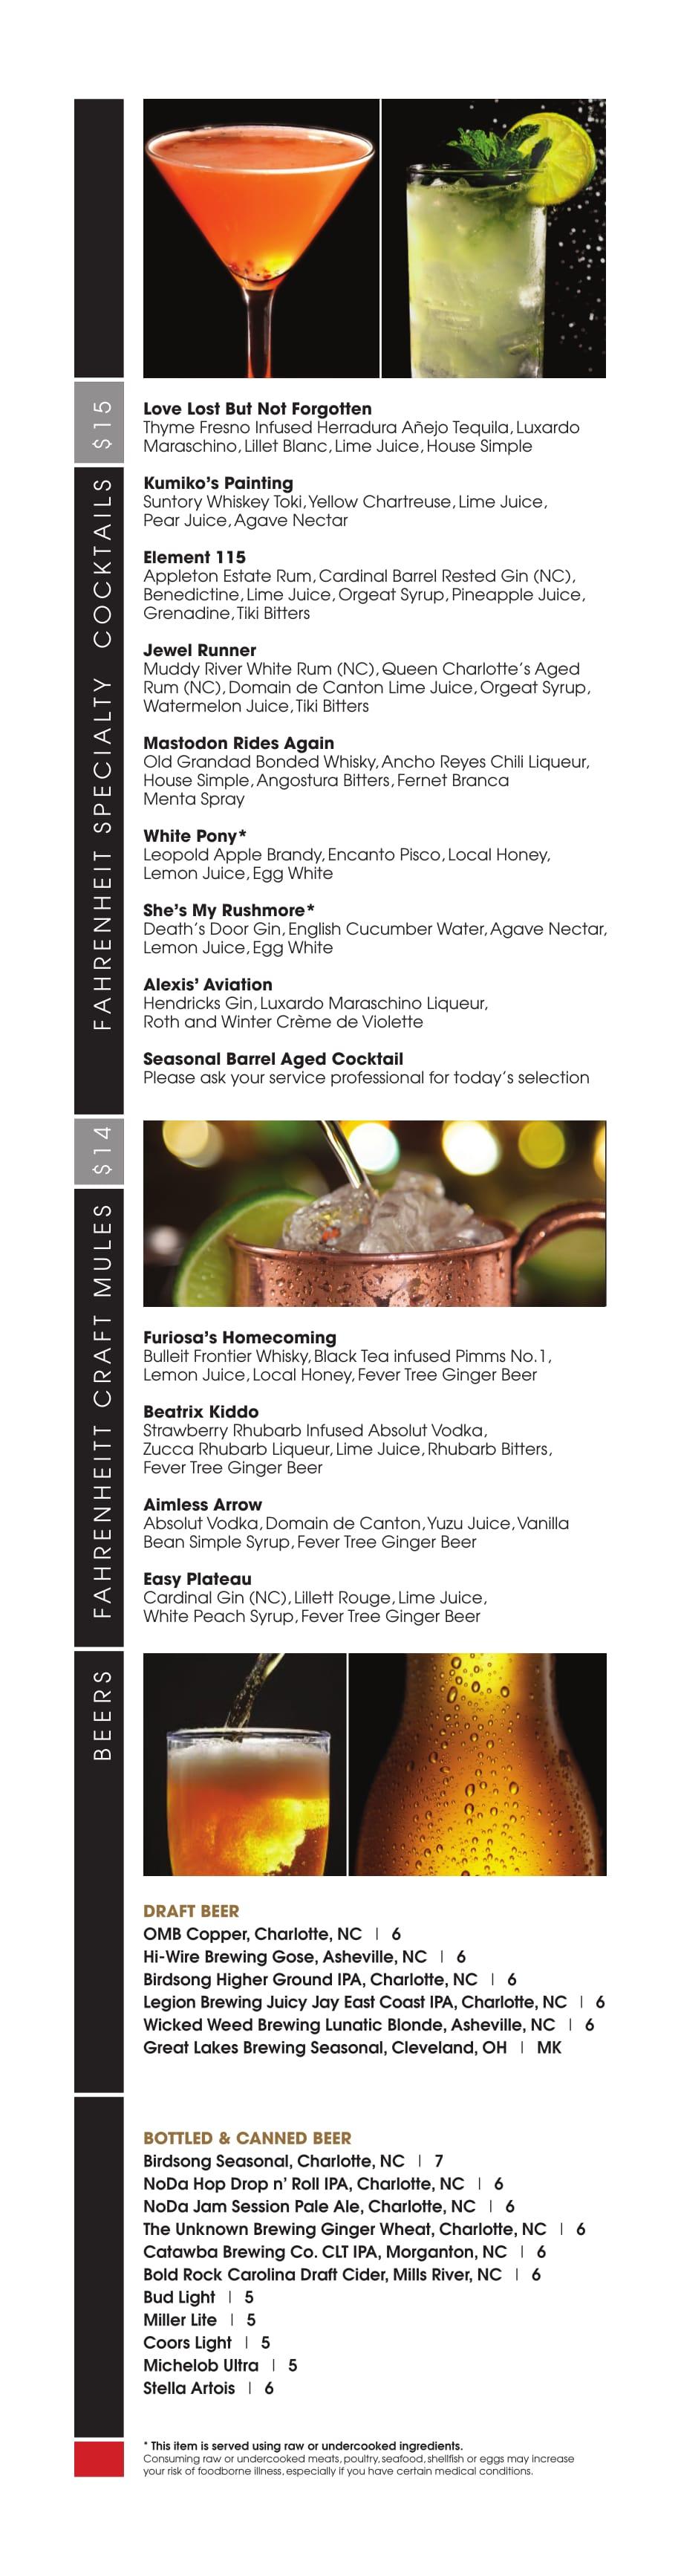 CLT_Drinks_062317_FINAL-1 - Chef Rocco Whalen